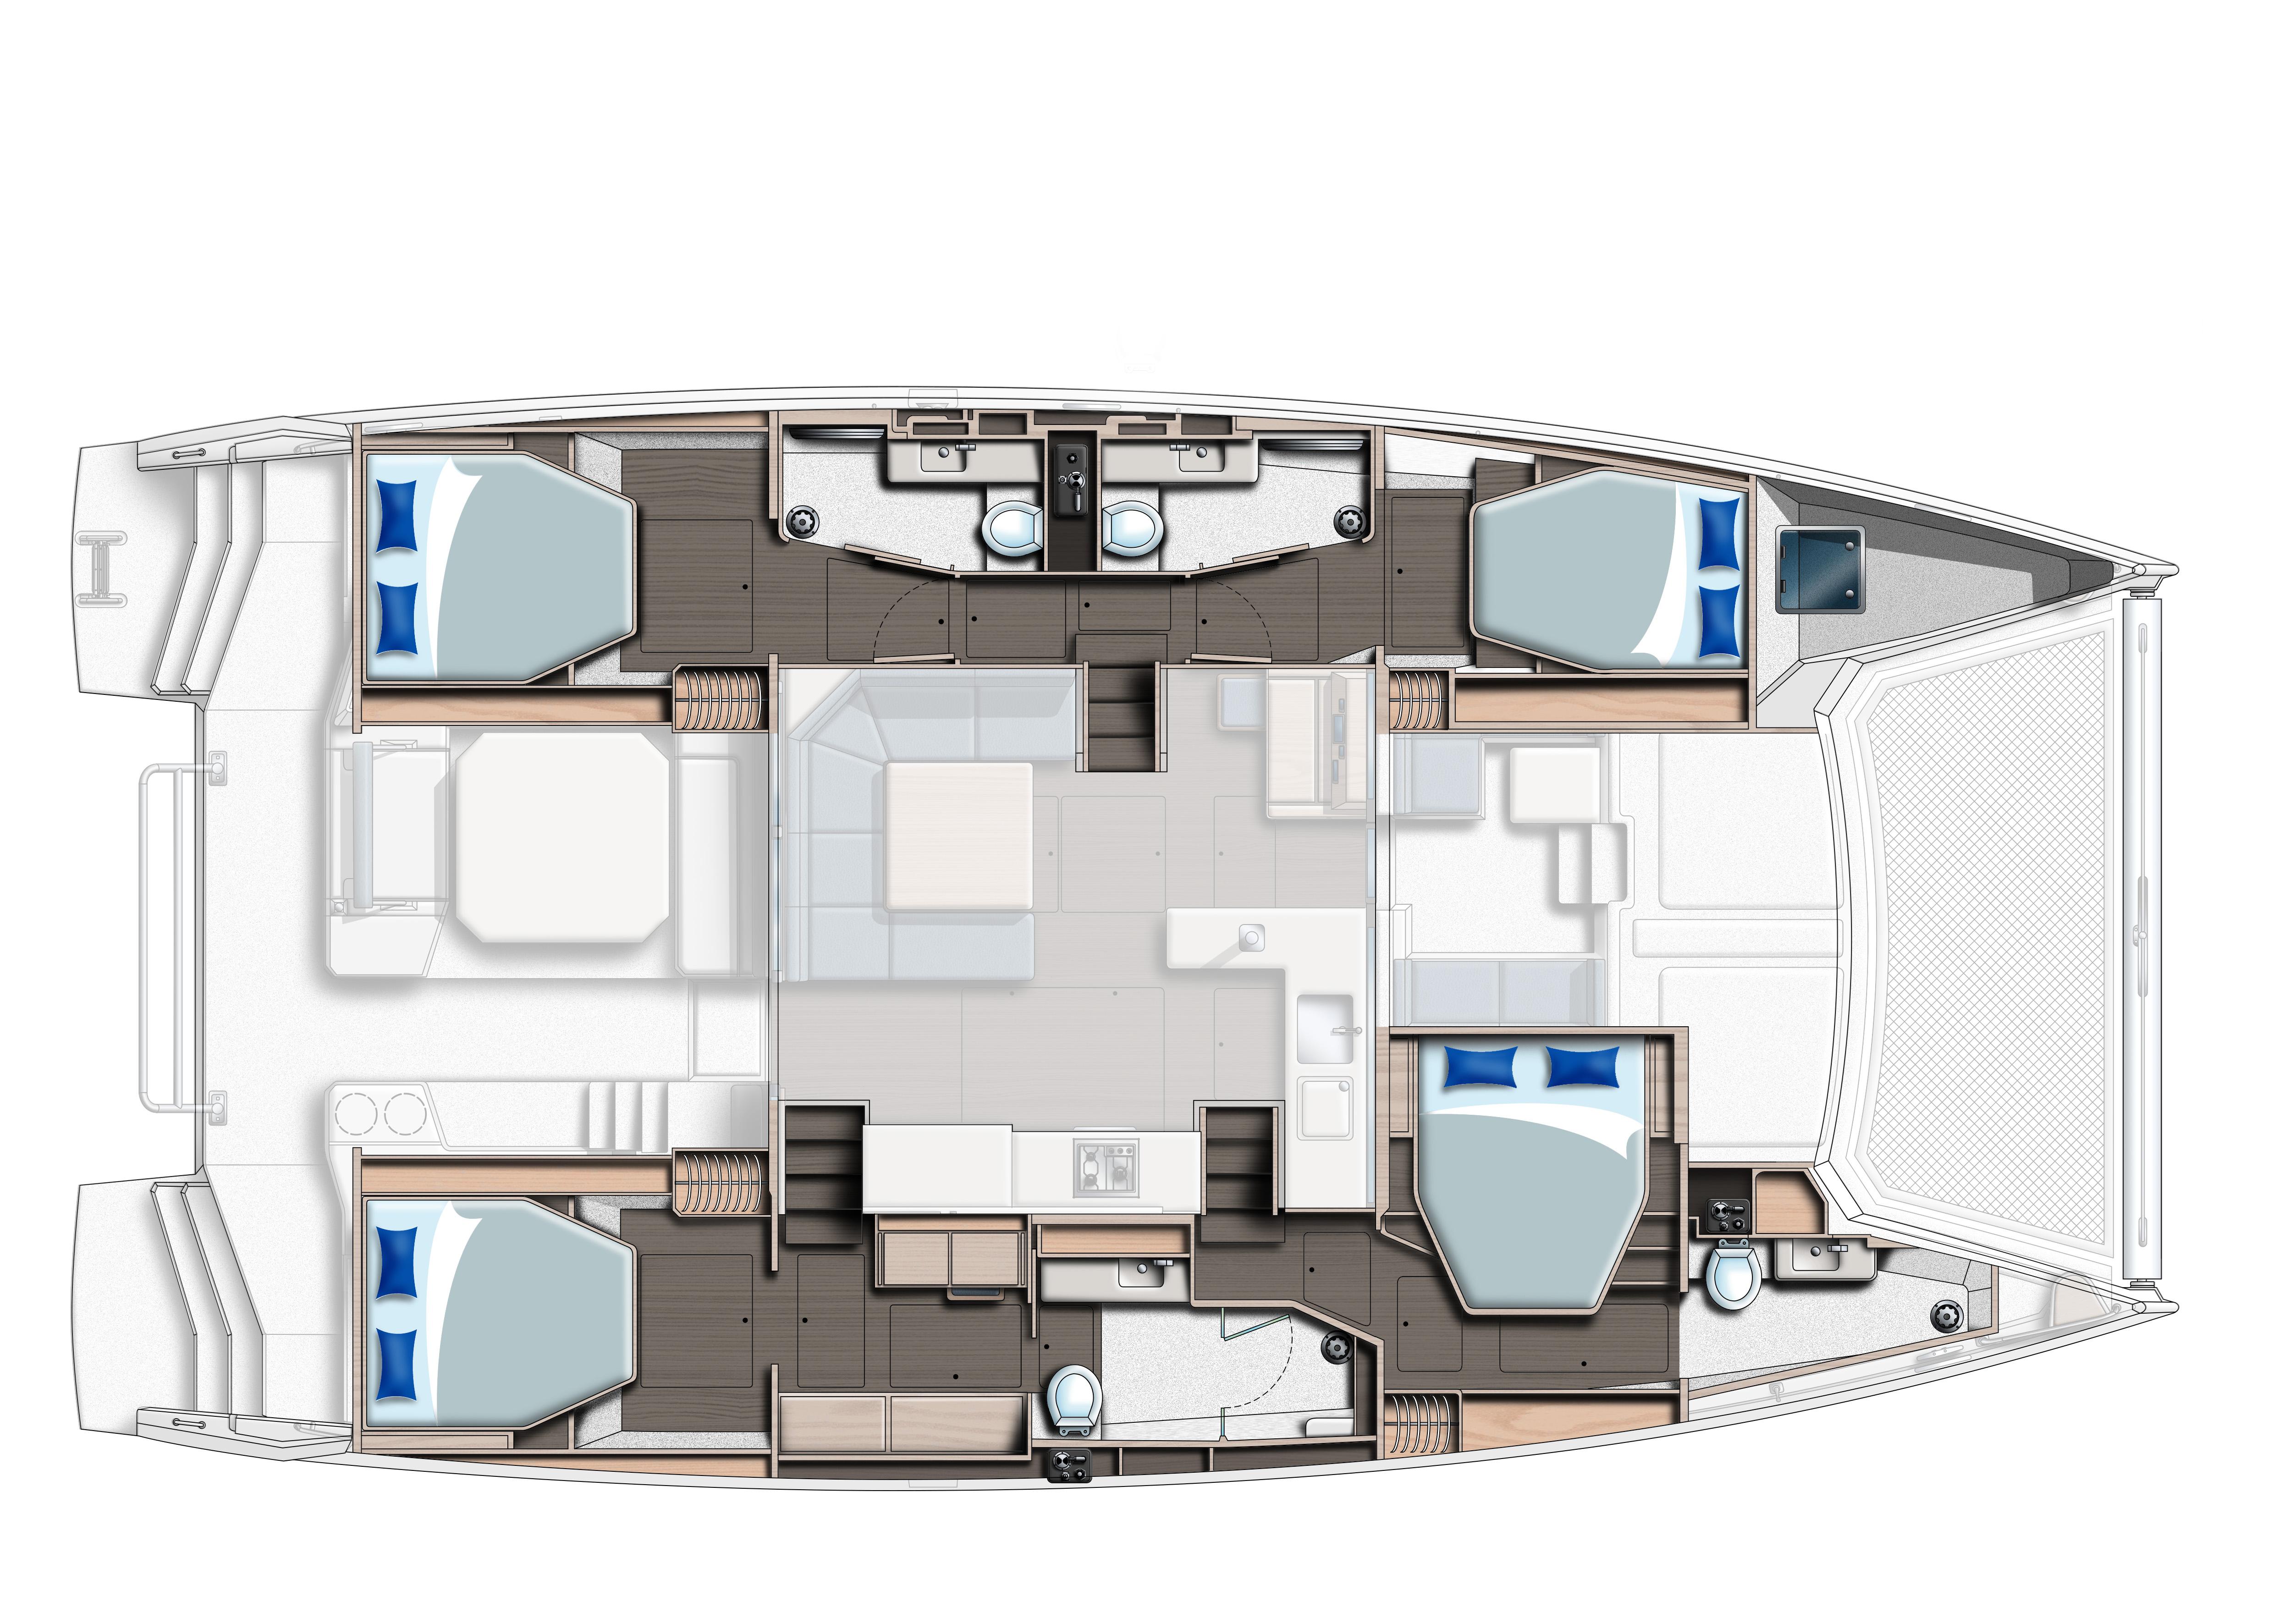 Moorings 5000 layout